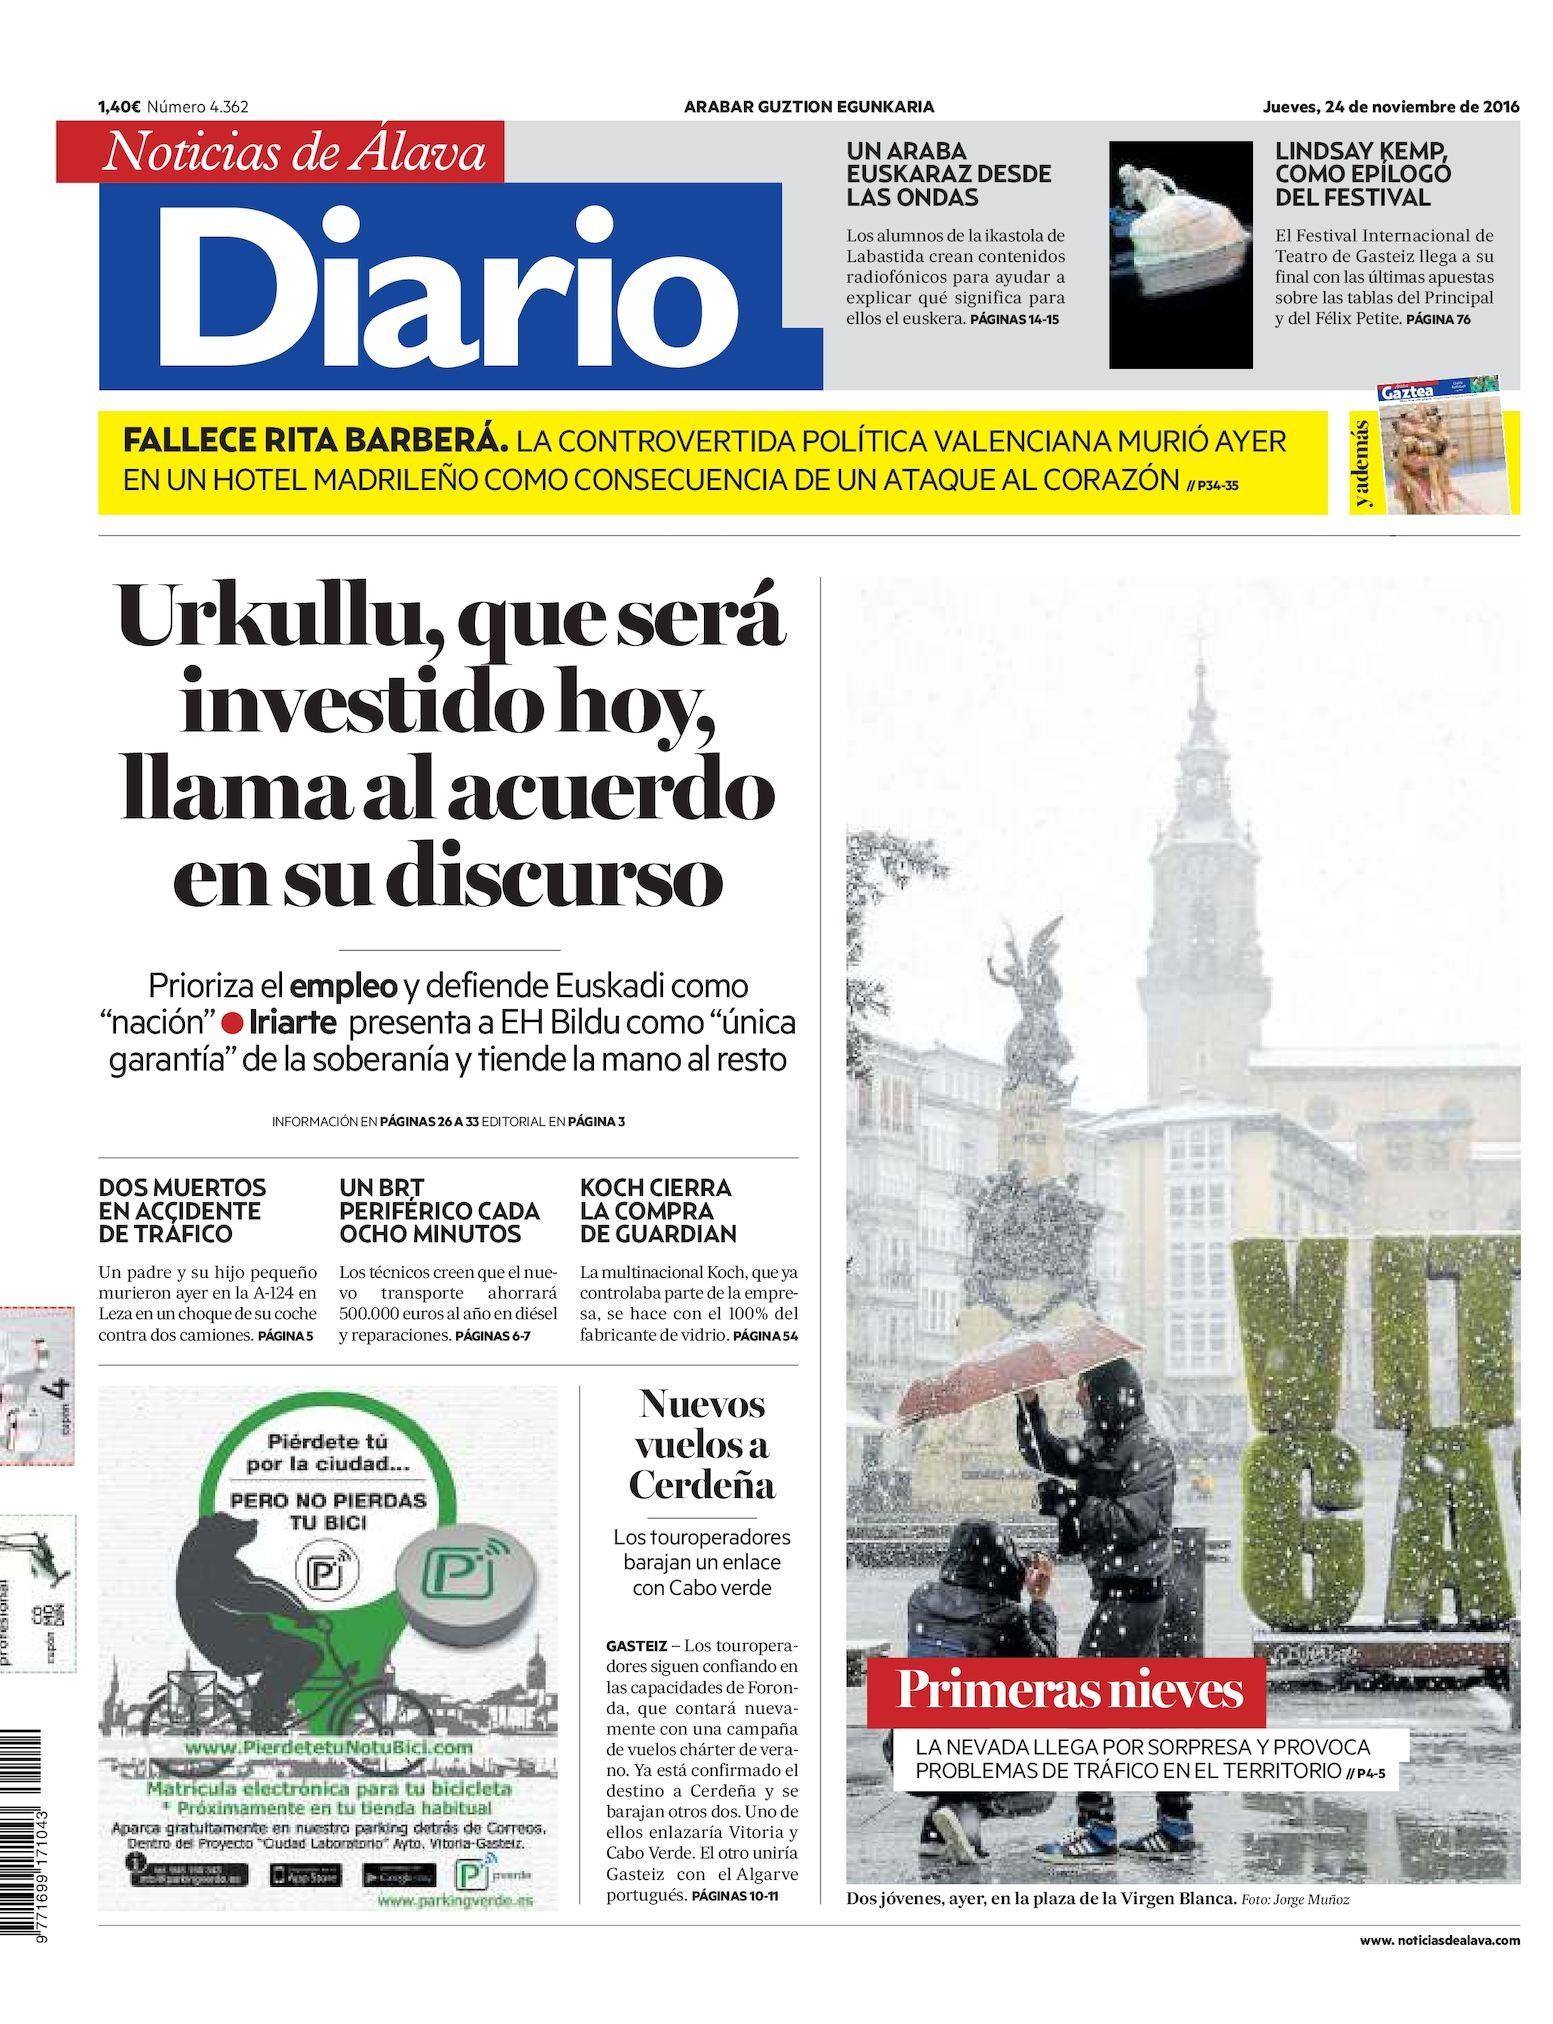 Calendario Escolar Fes Zaragoza 2019 Más Recientes Calaméo Diario De Noticias De lava